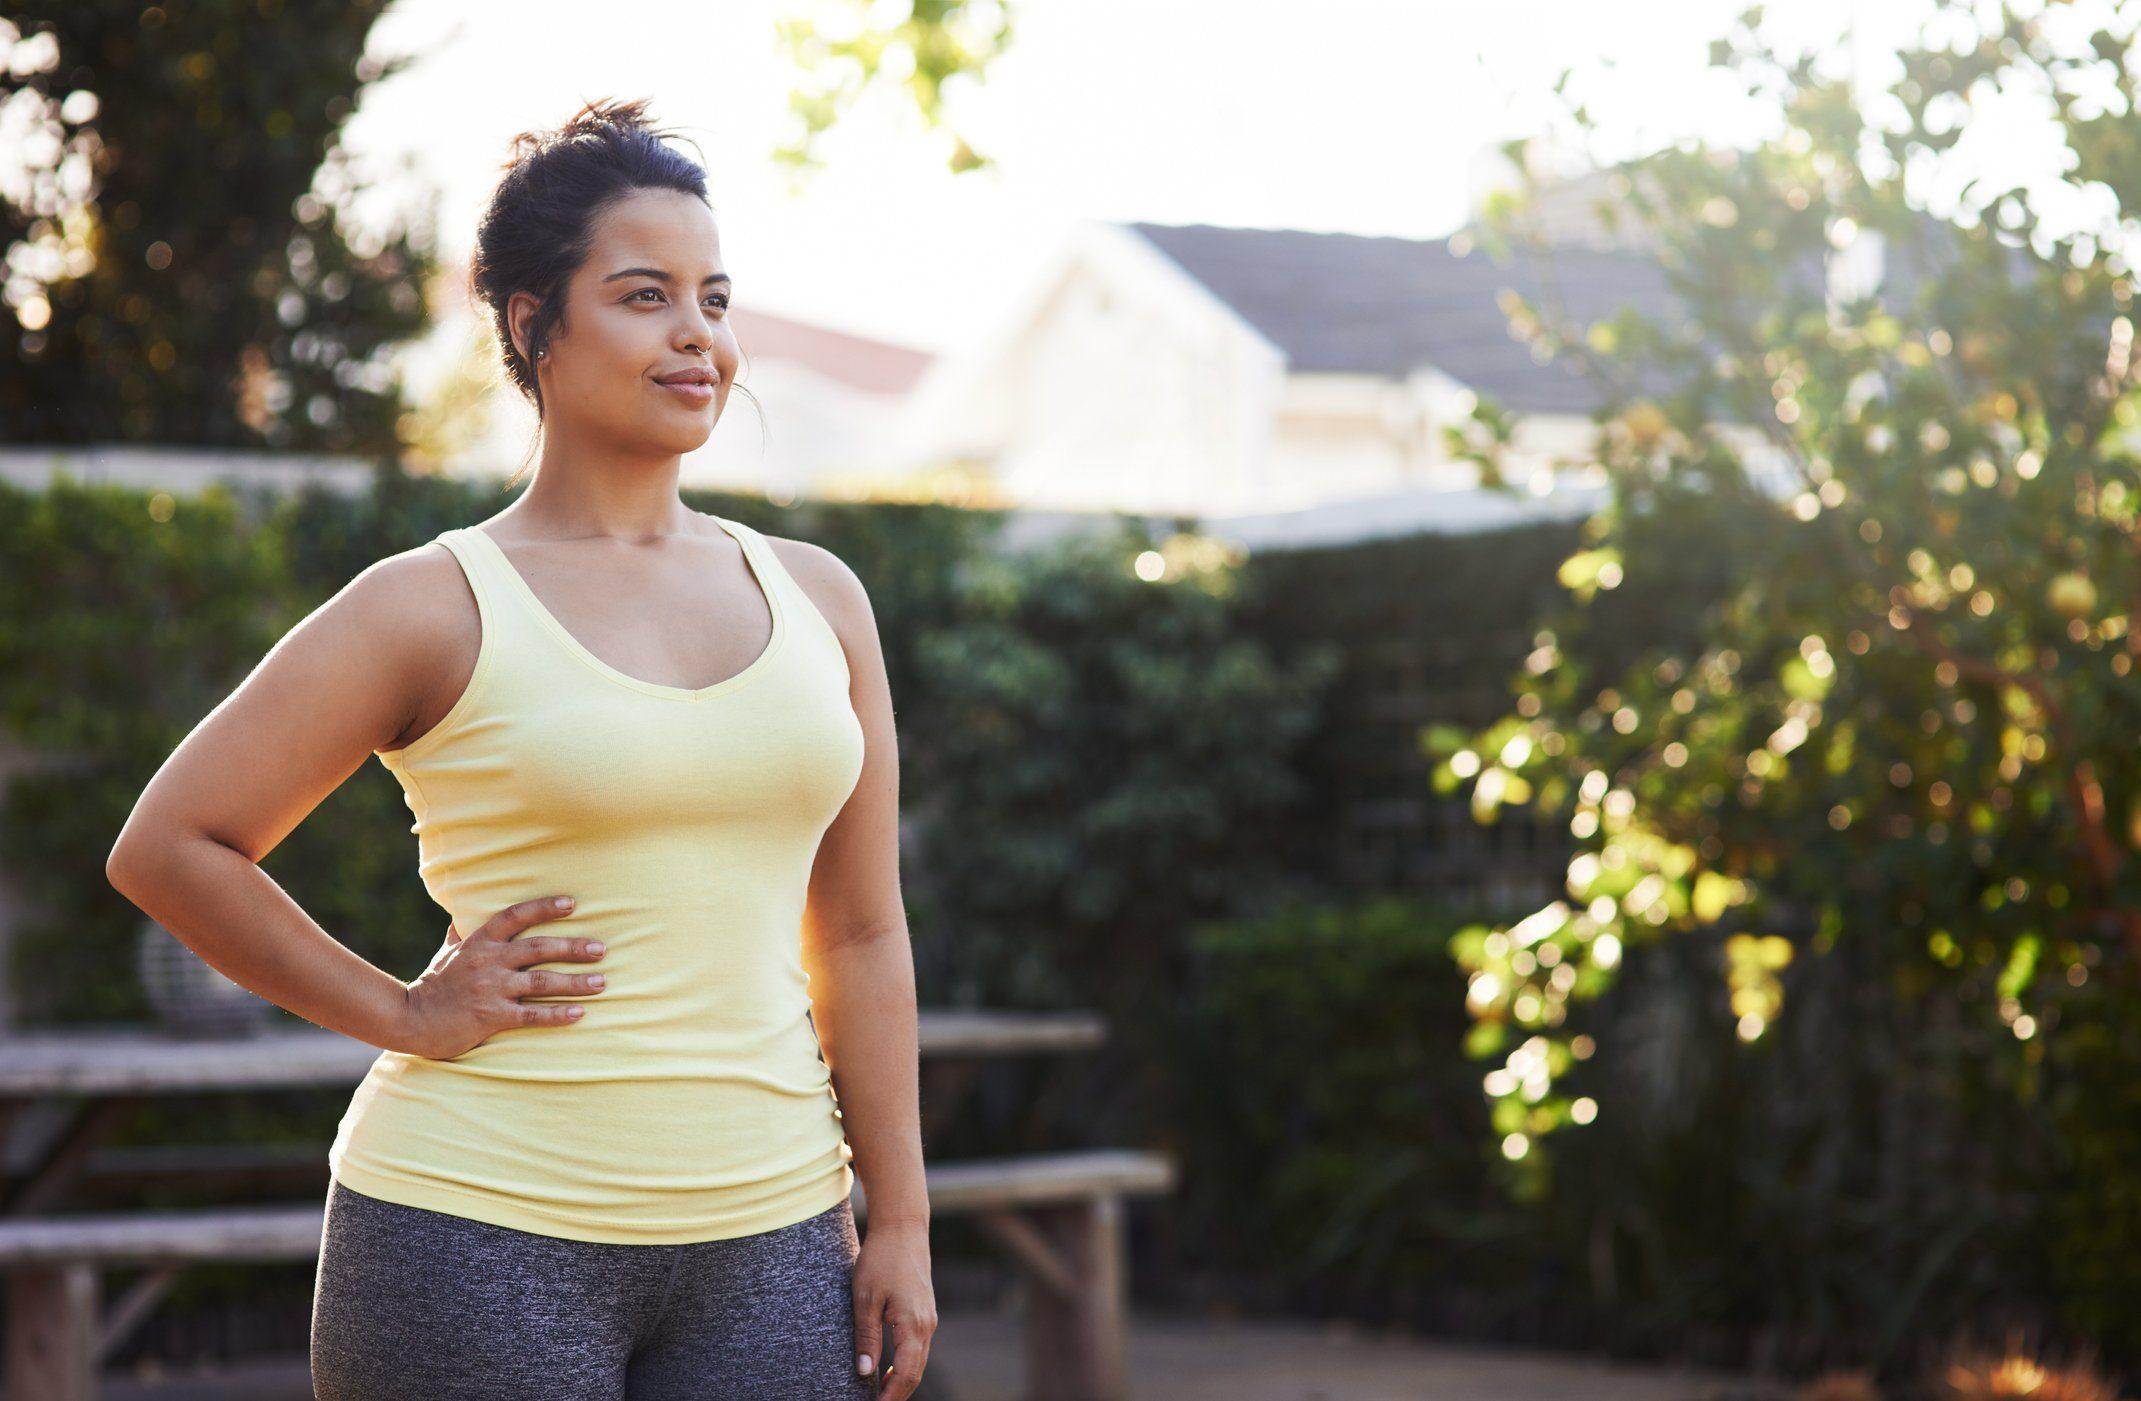 Woman strength-training outdoors